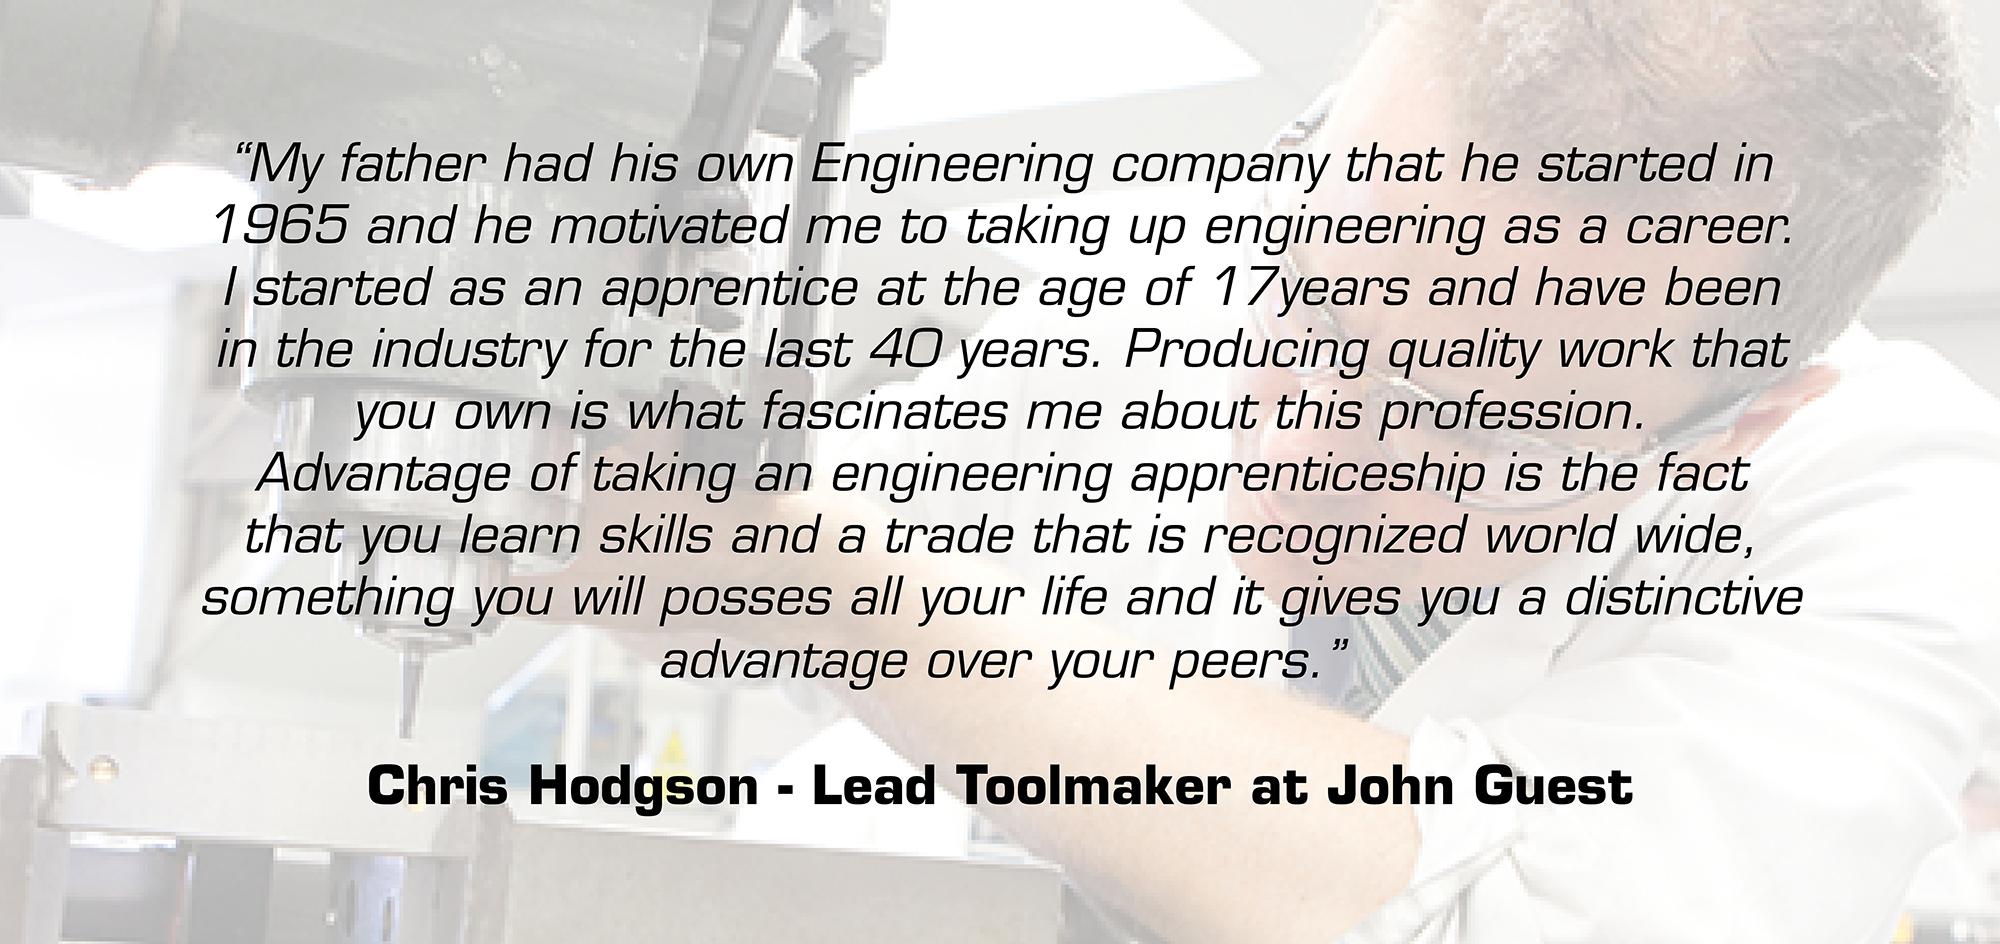 Chris Hodges apprentice quote